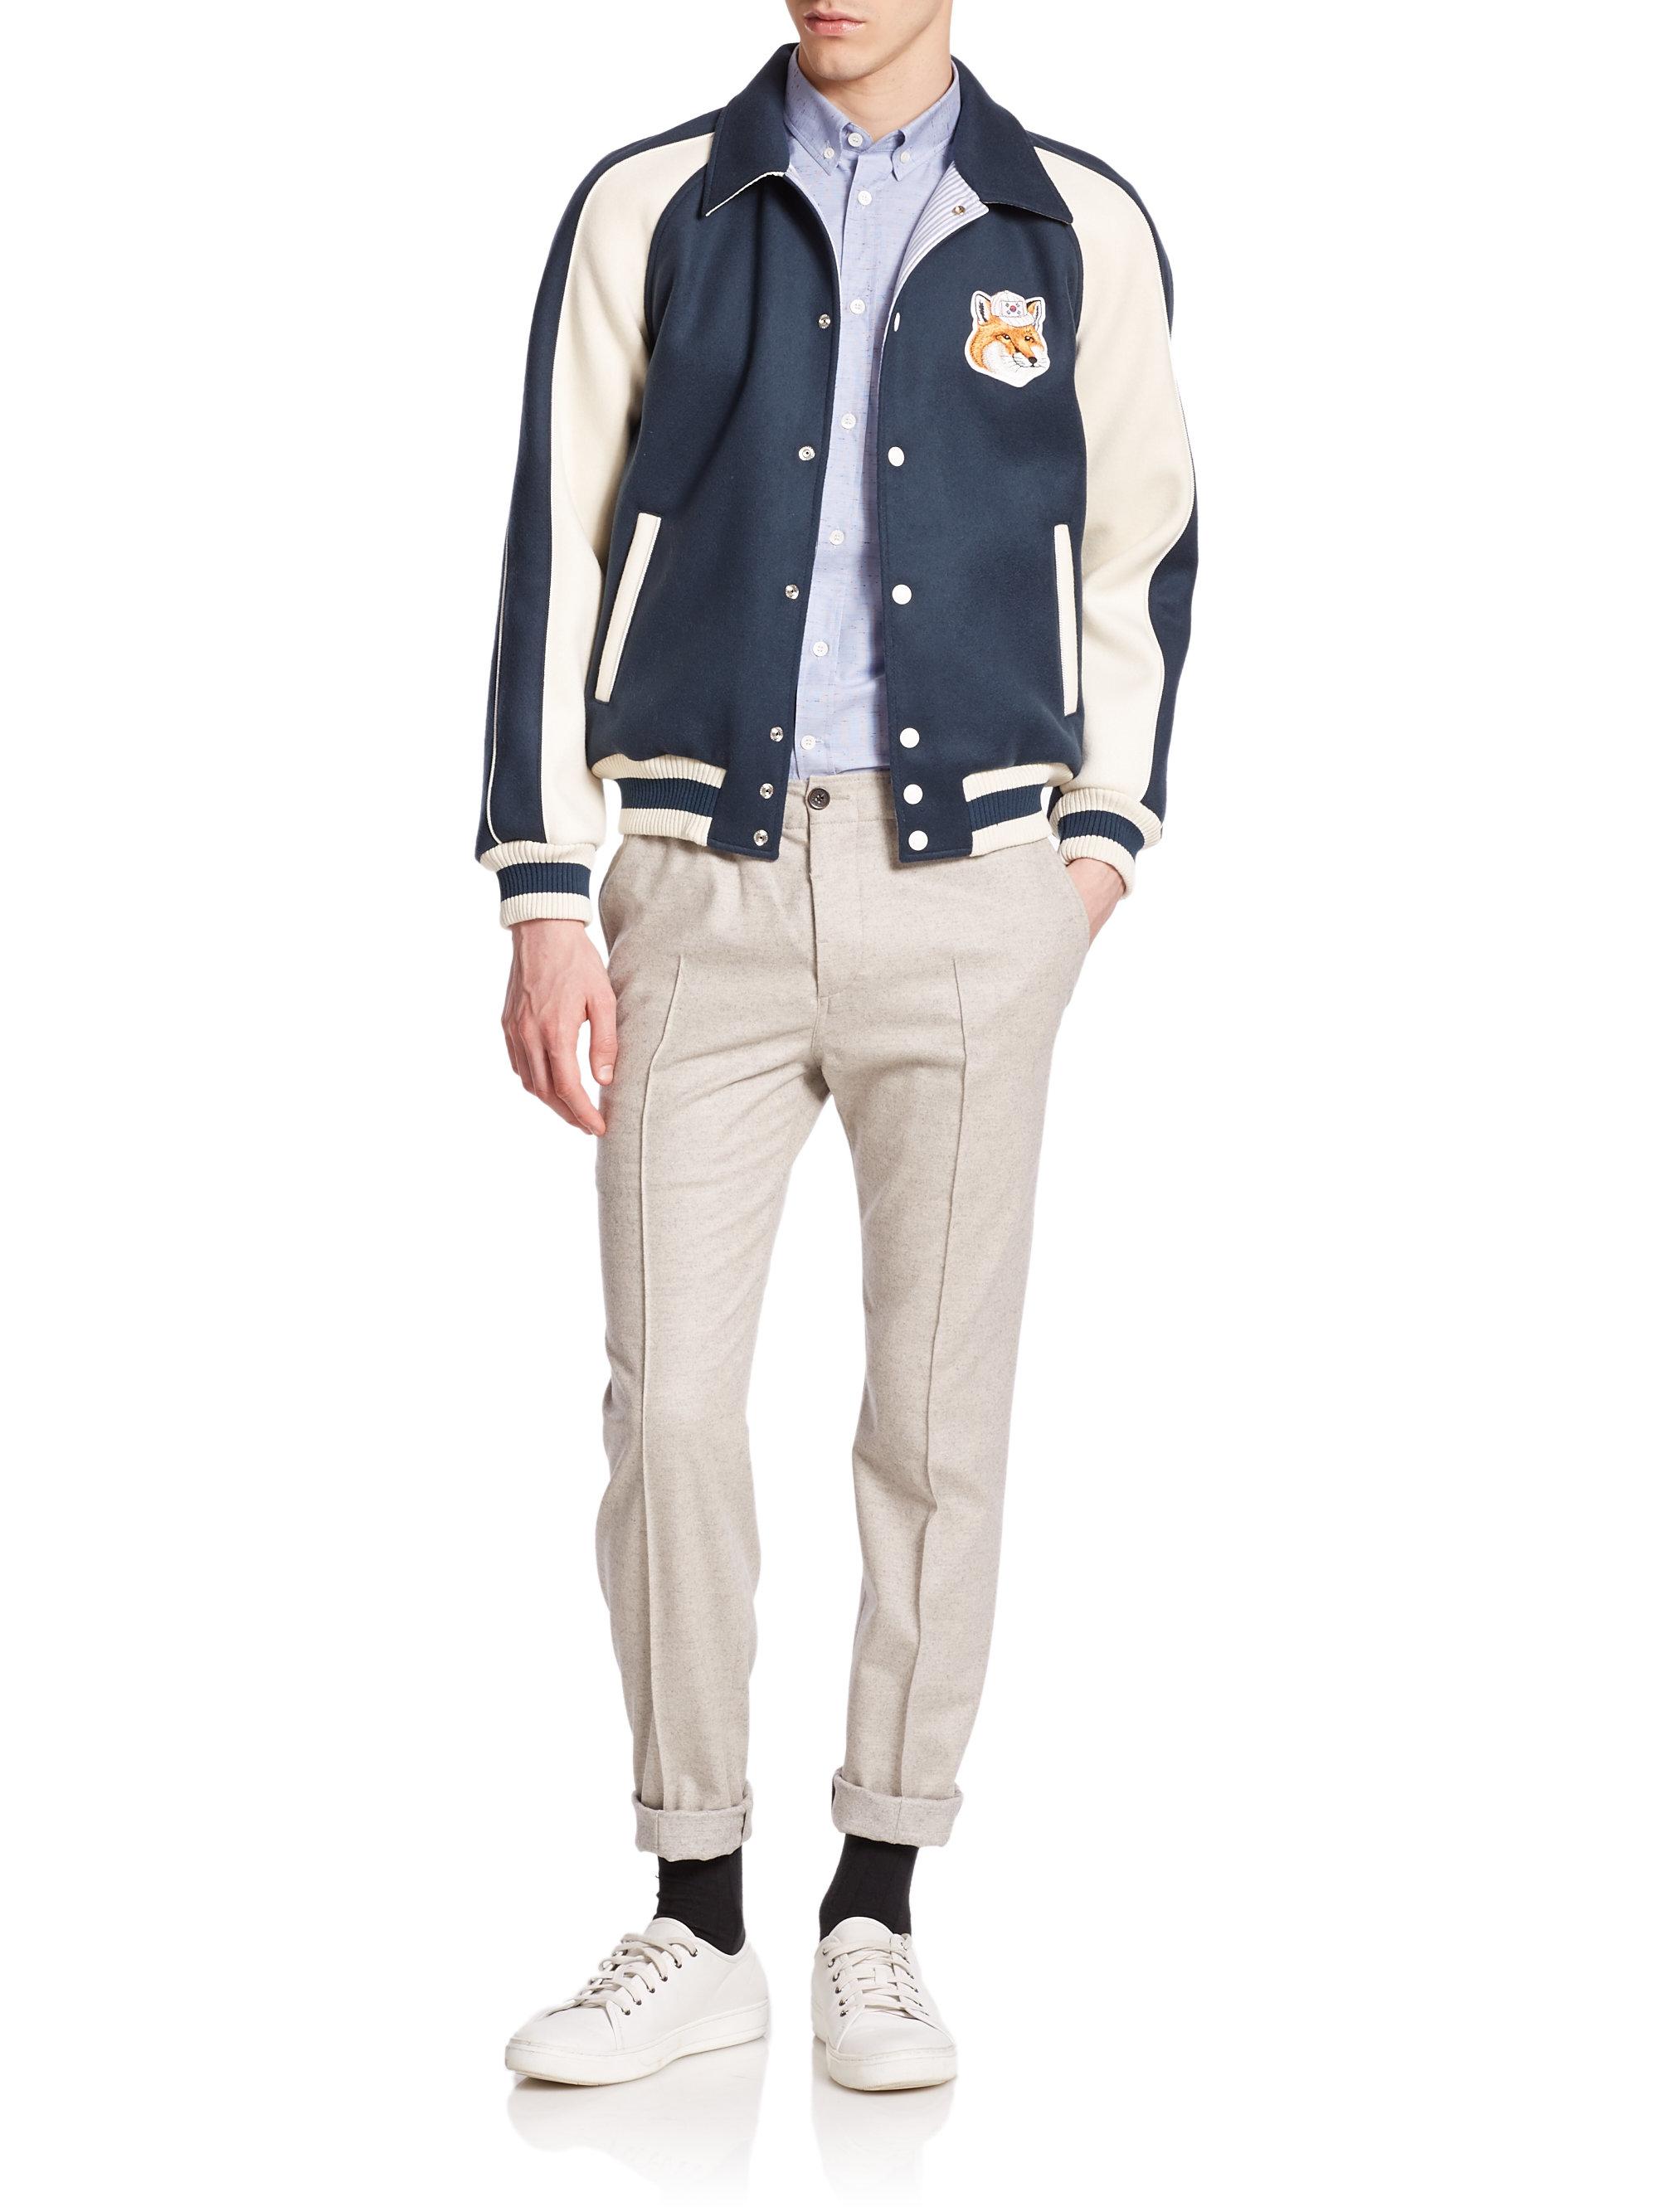 a73a3ee1329d Lyst - Maison Kitsuné Teddy Two-tone Varsity Jacket in Blue for Men